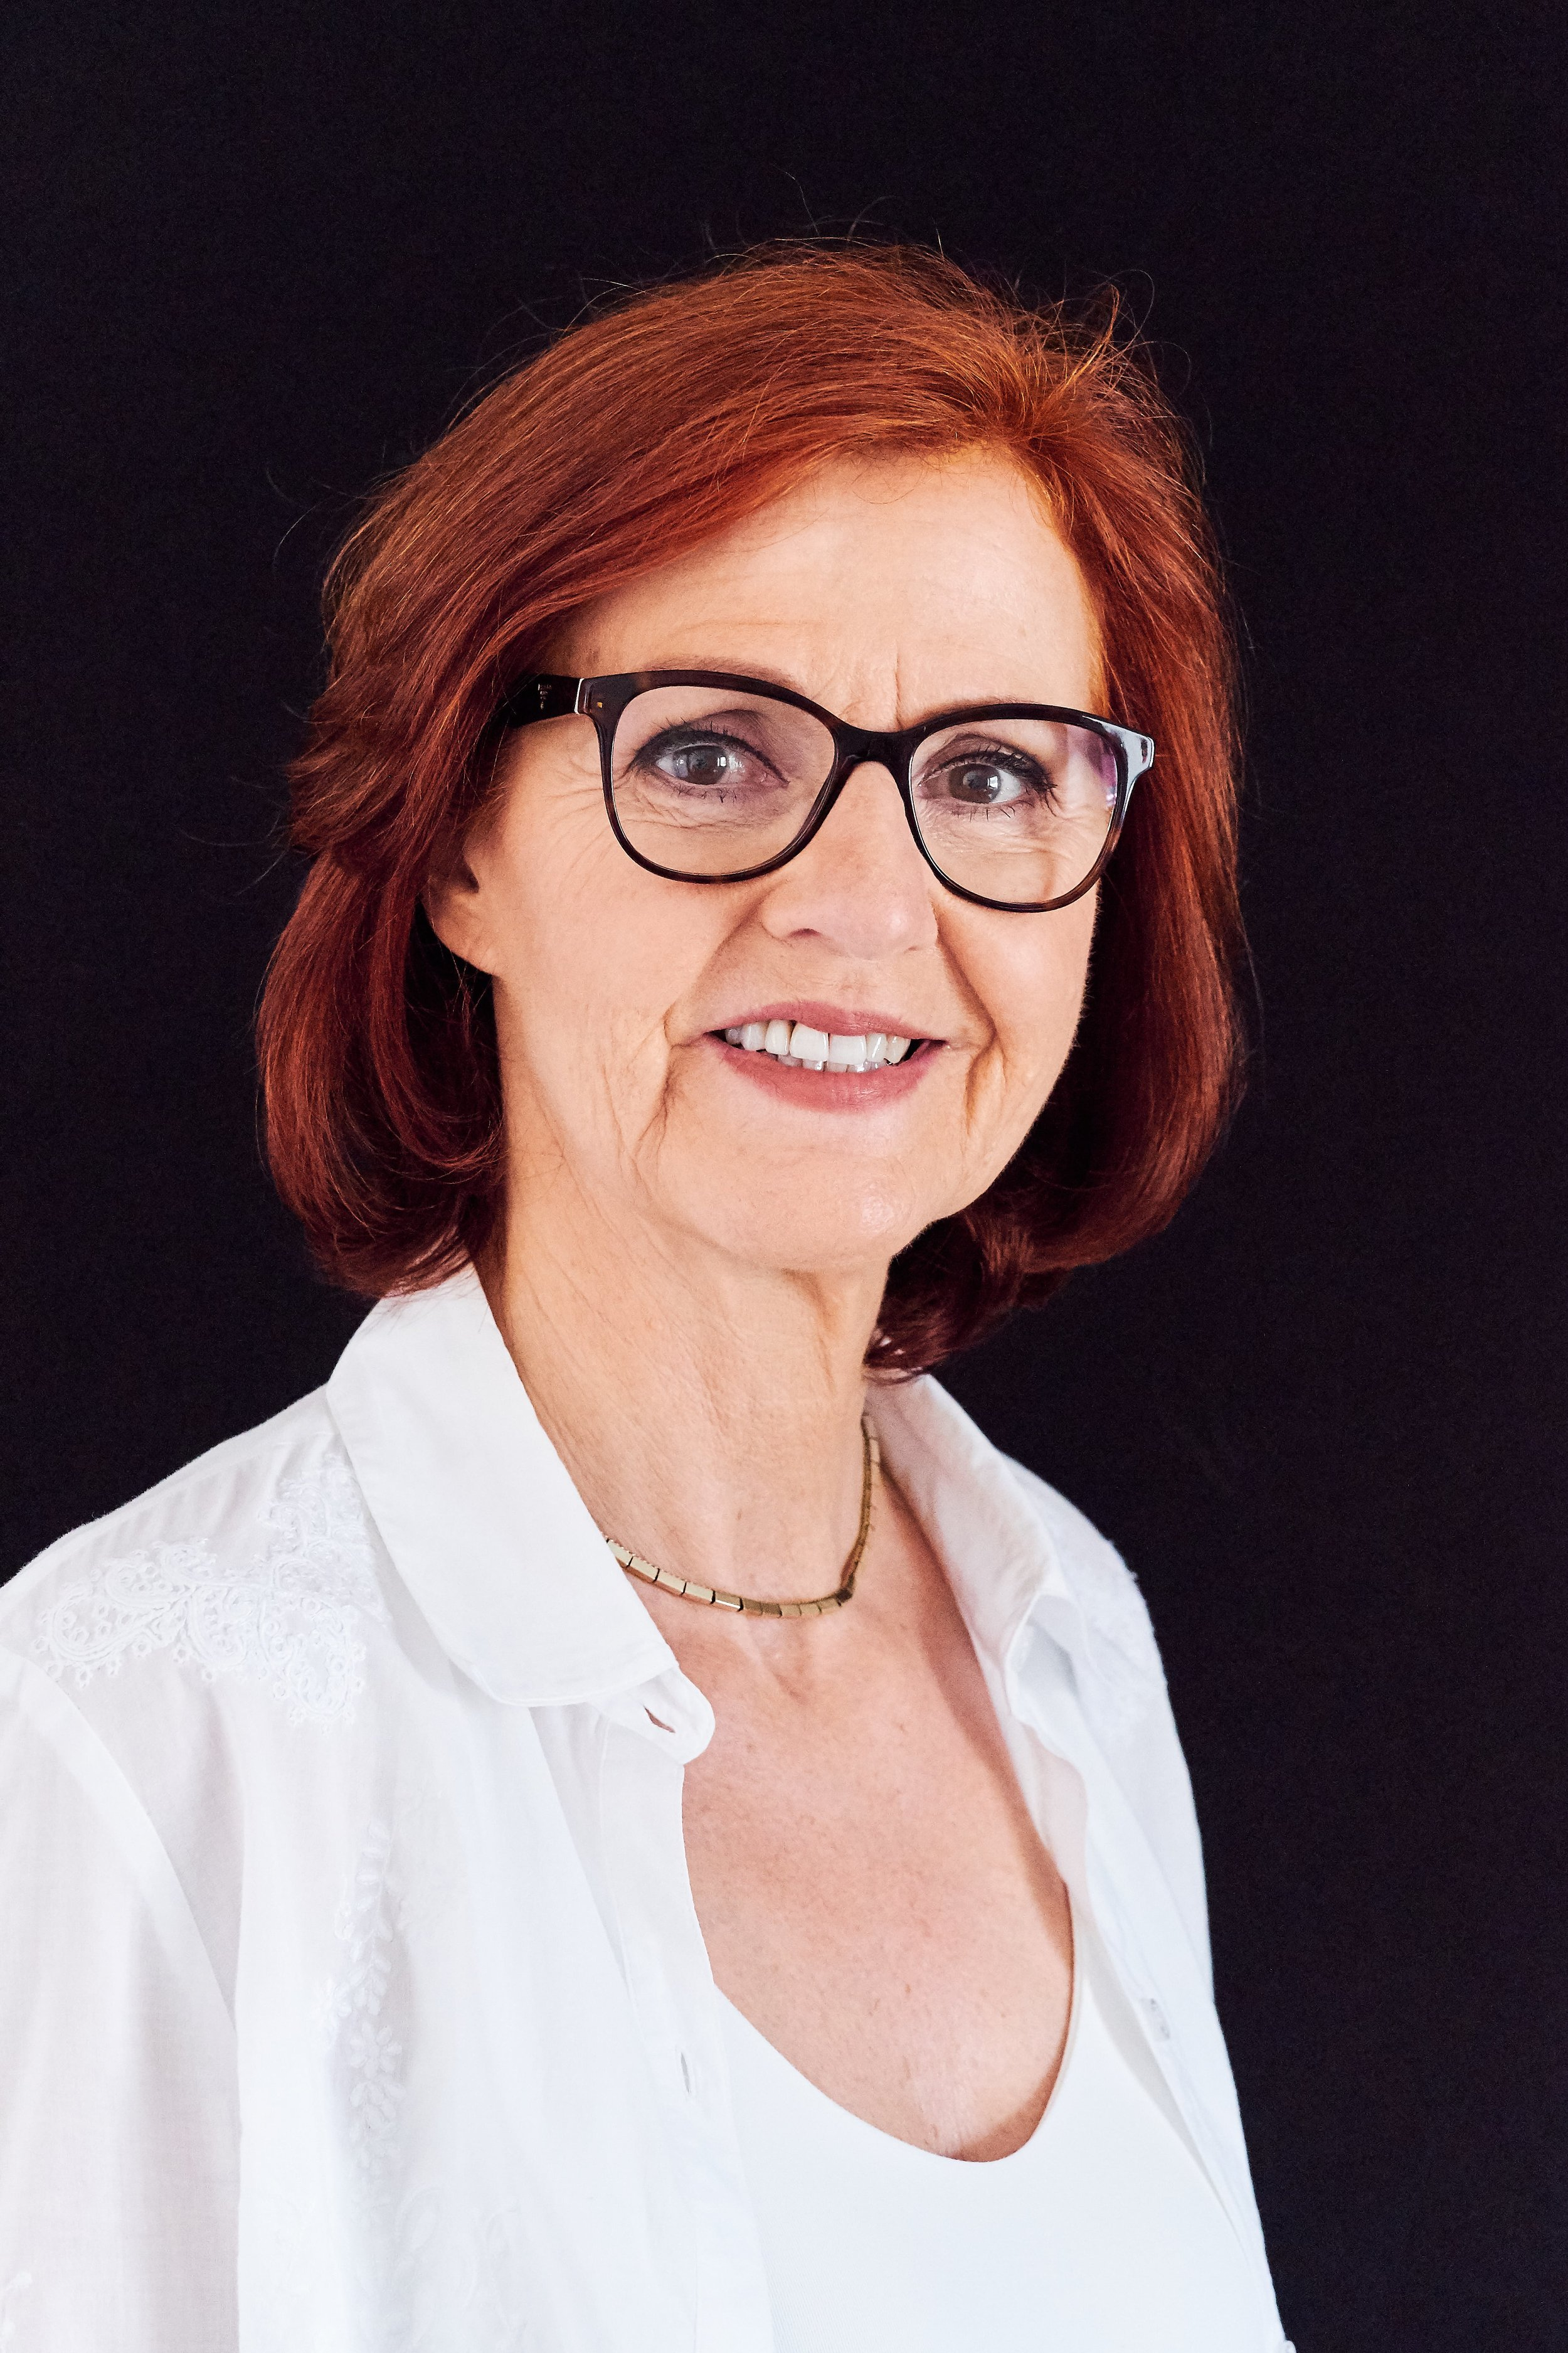 Claudia Callejon - Augenoptikerin